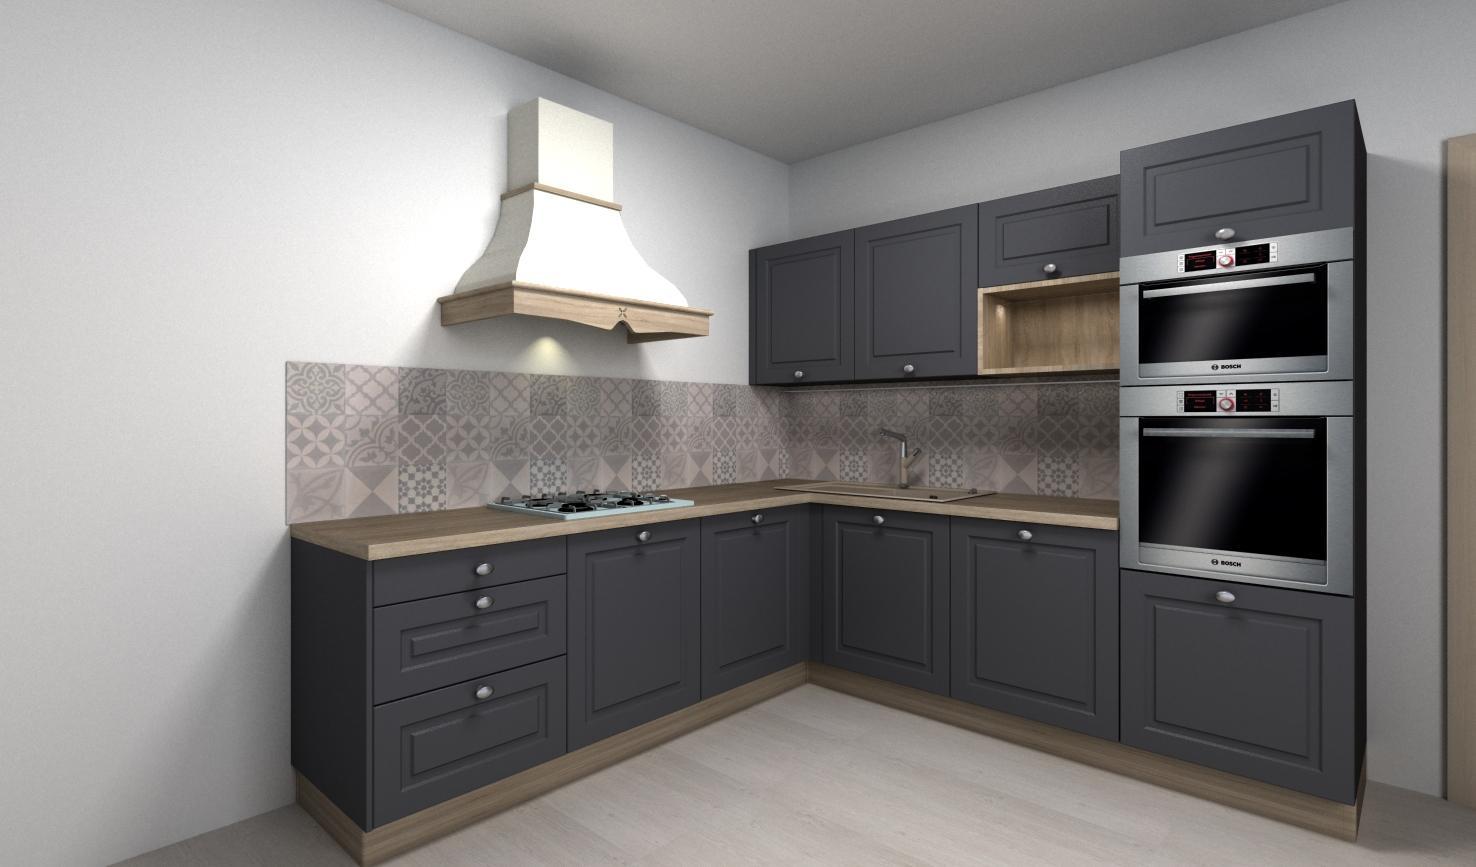 Kuchyne - Obrázok č. 49